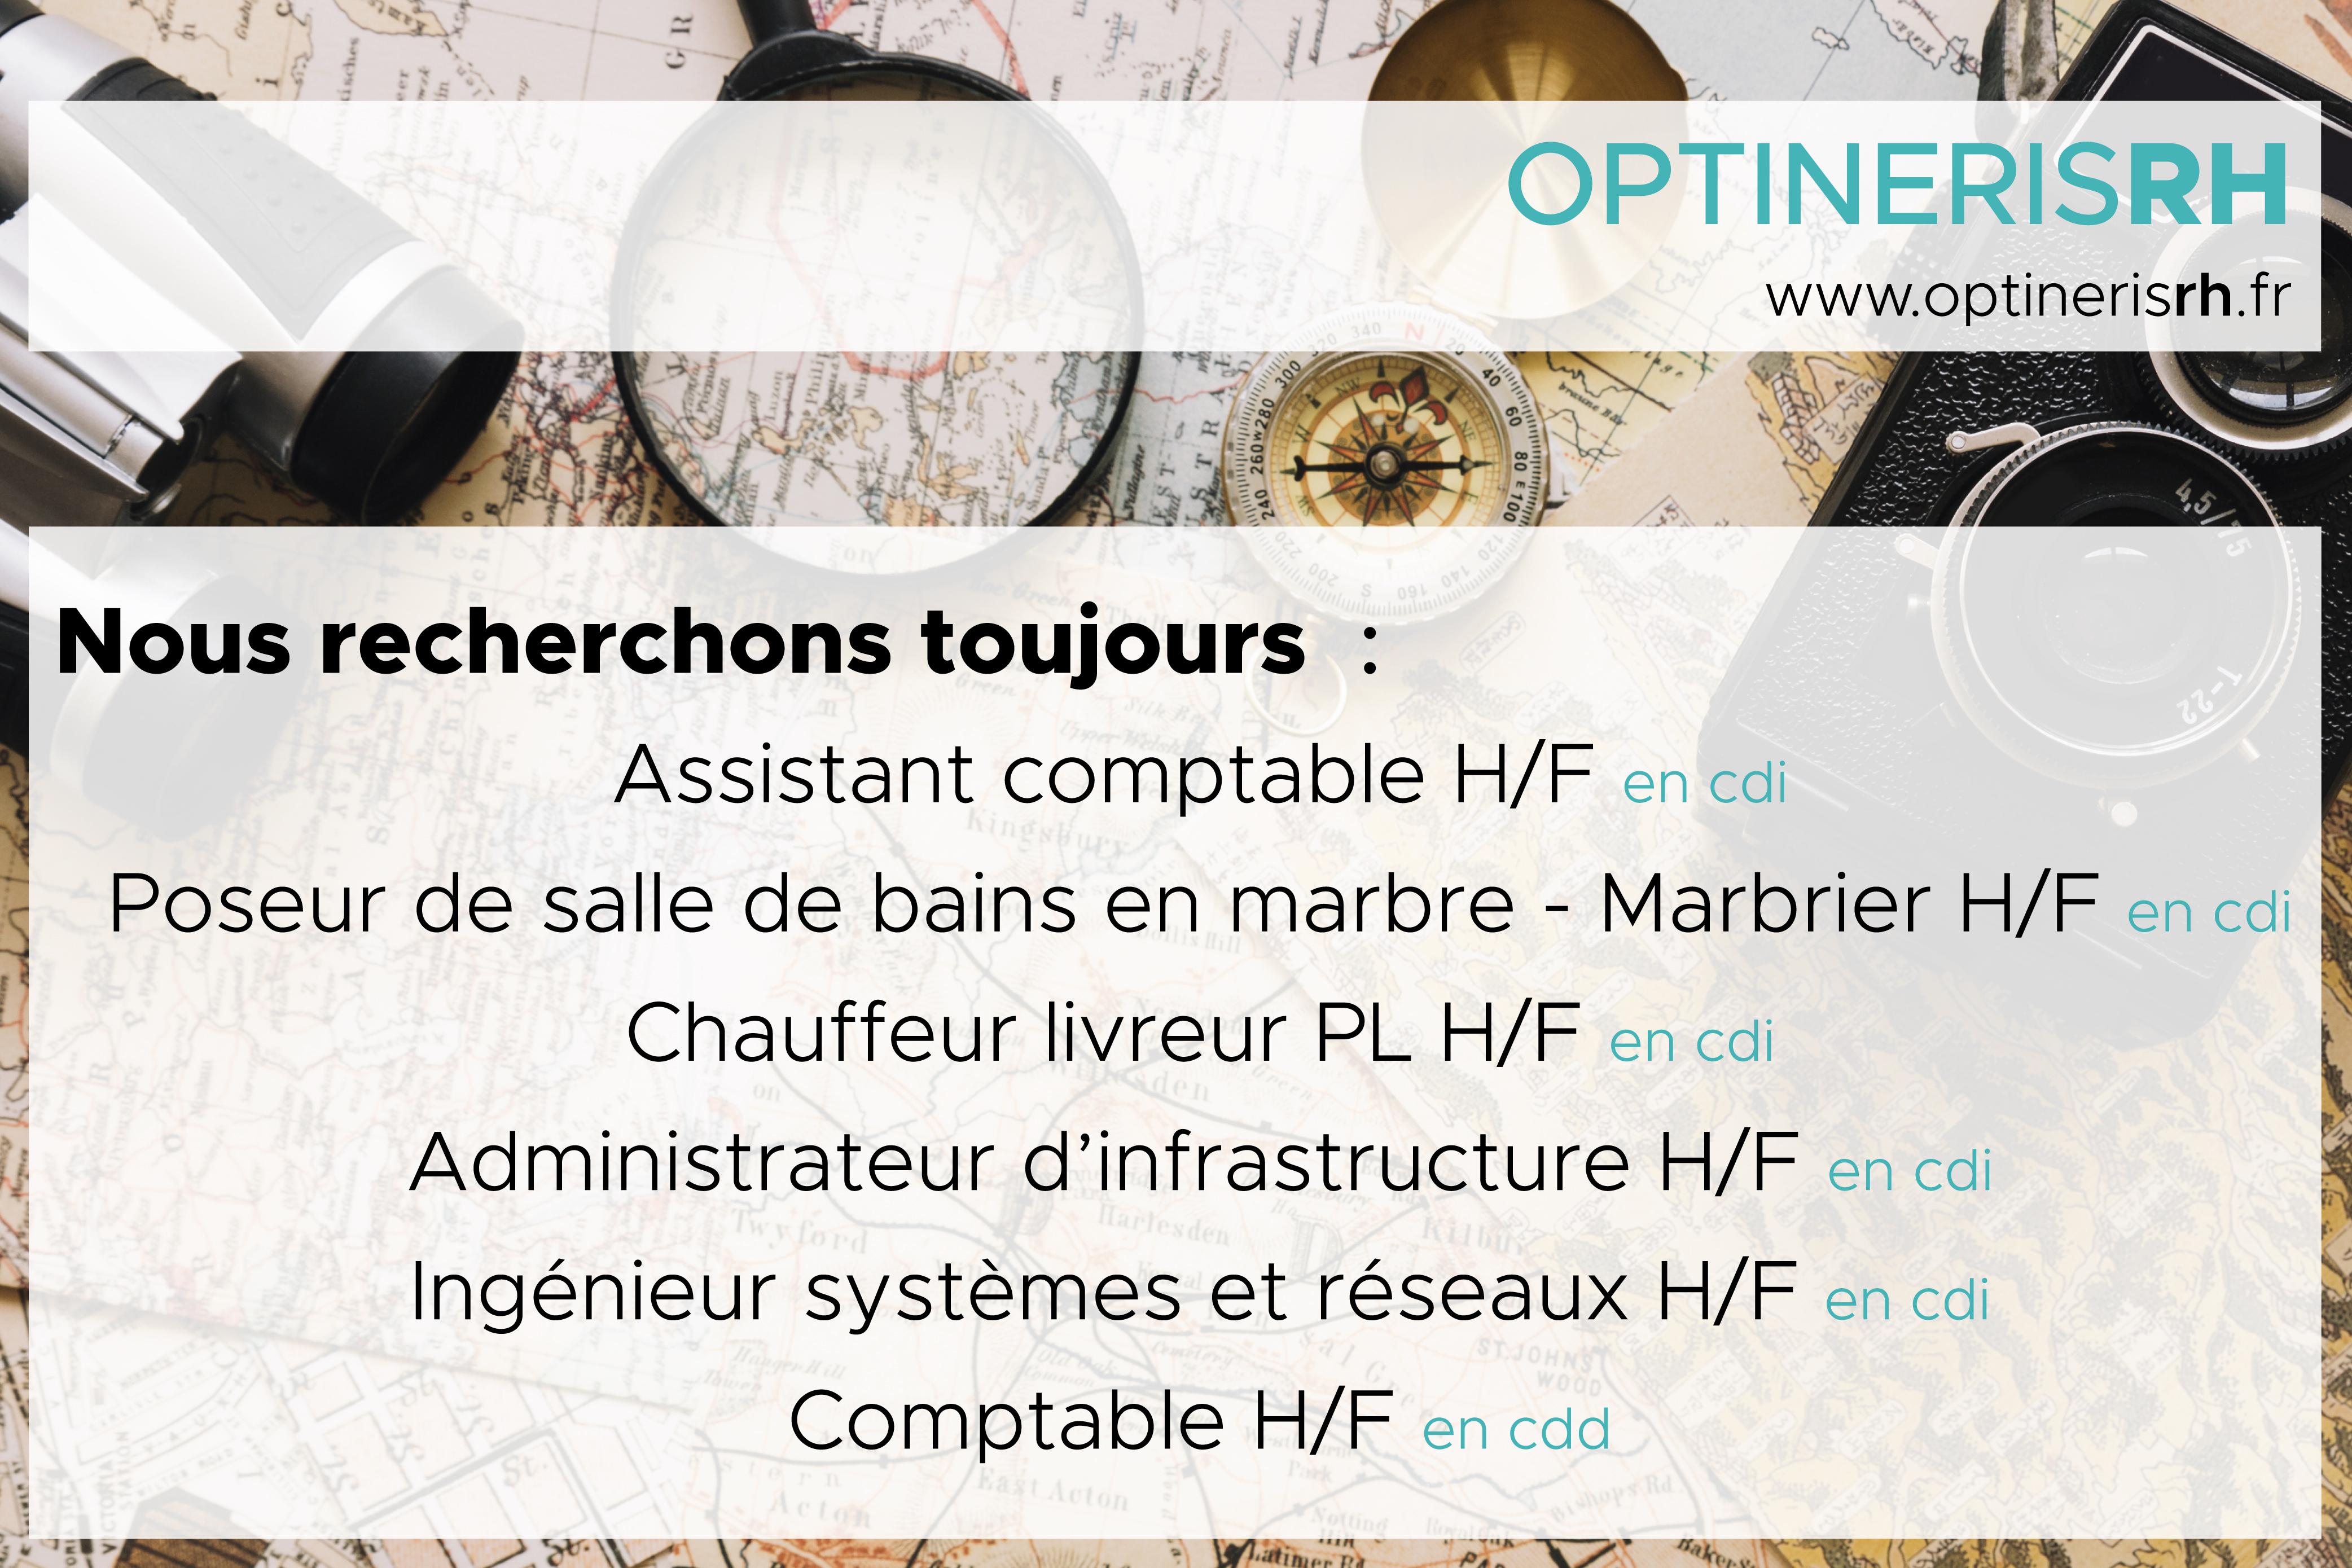 OPTINERIS RH - Offre d'emploi - Octobre 2018